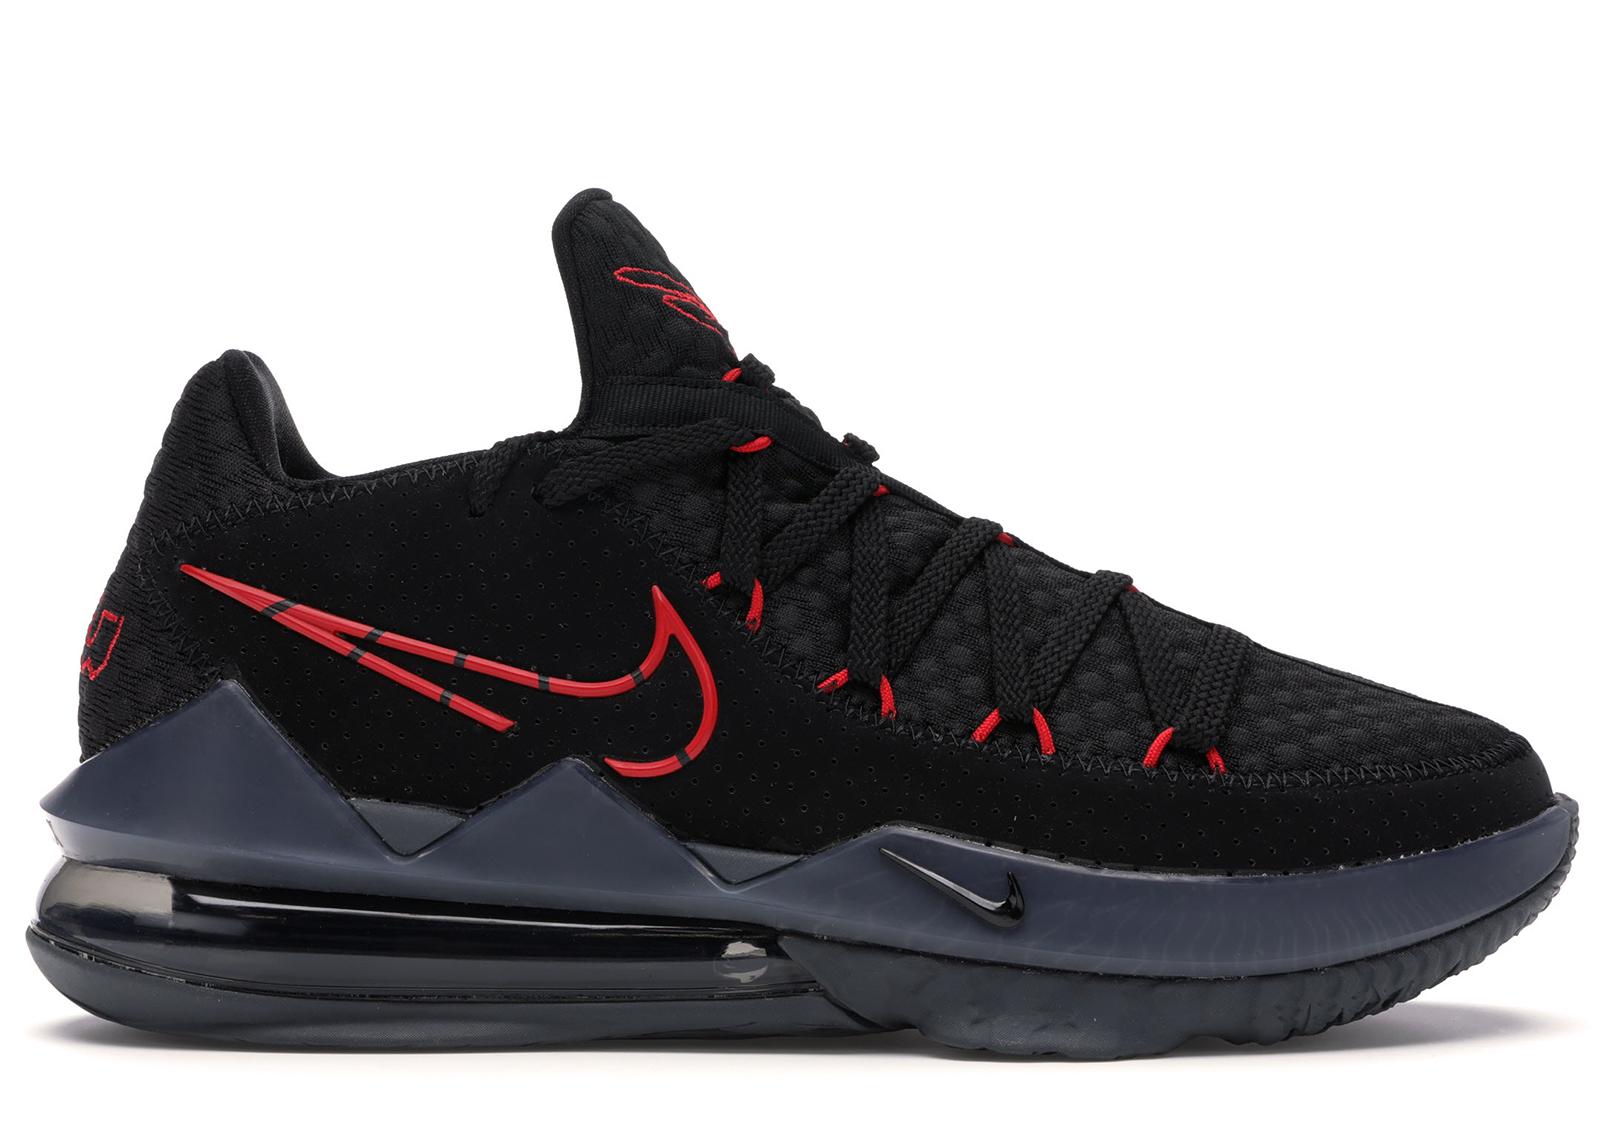 Nike LeBron 17 Low Black Red Dark Grey